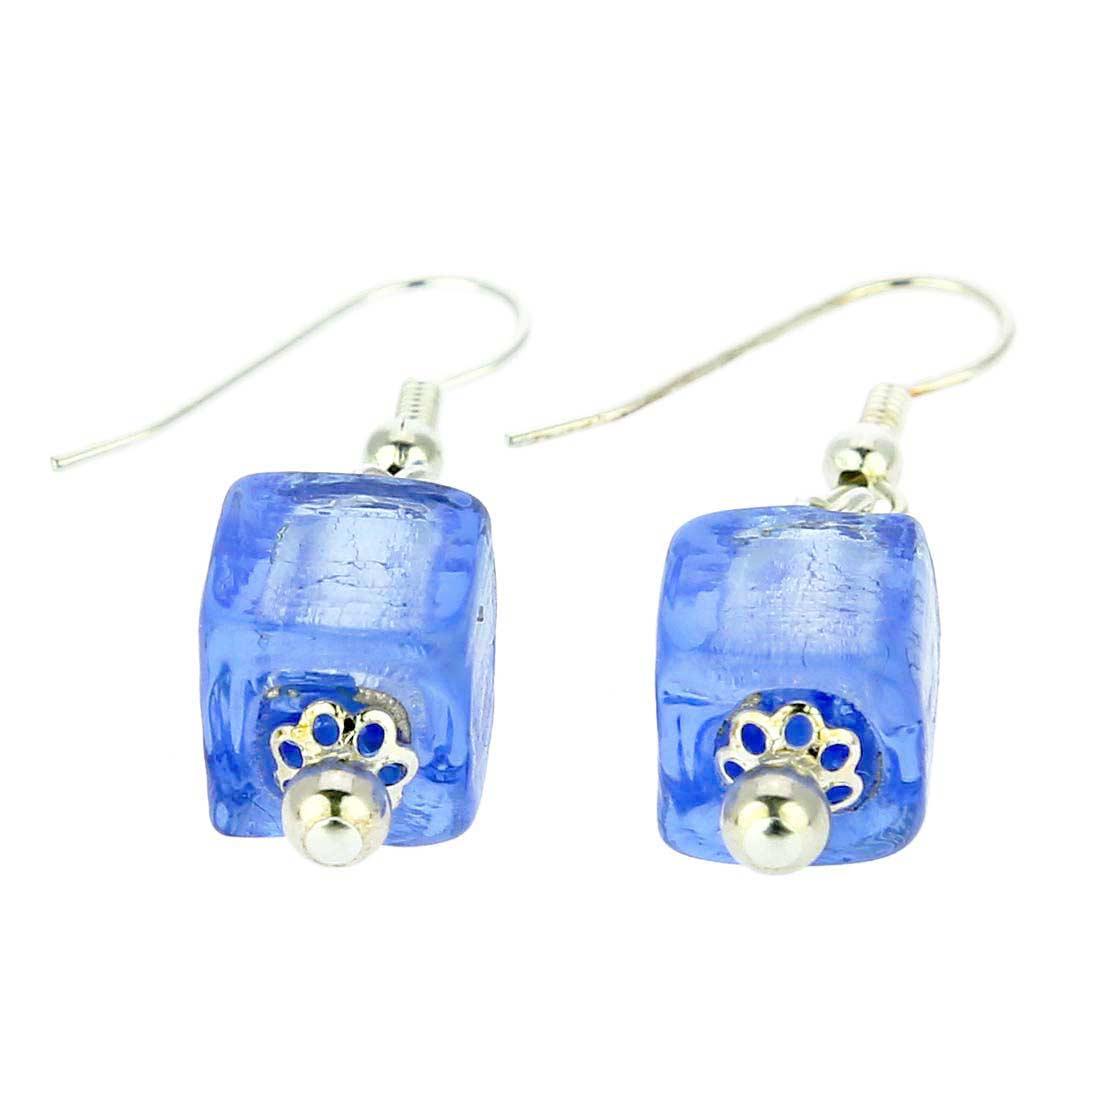 Antico Tesoro Cubes Earrings - Silver Ice